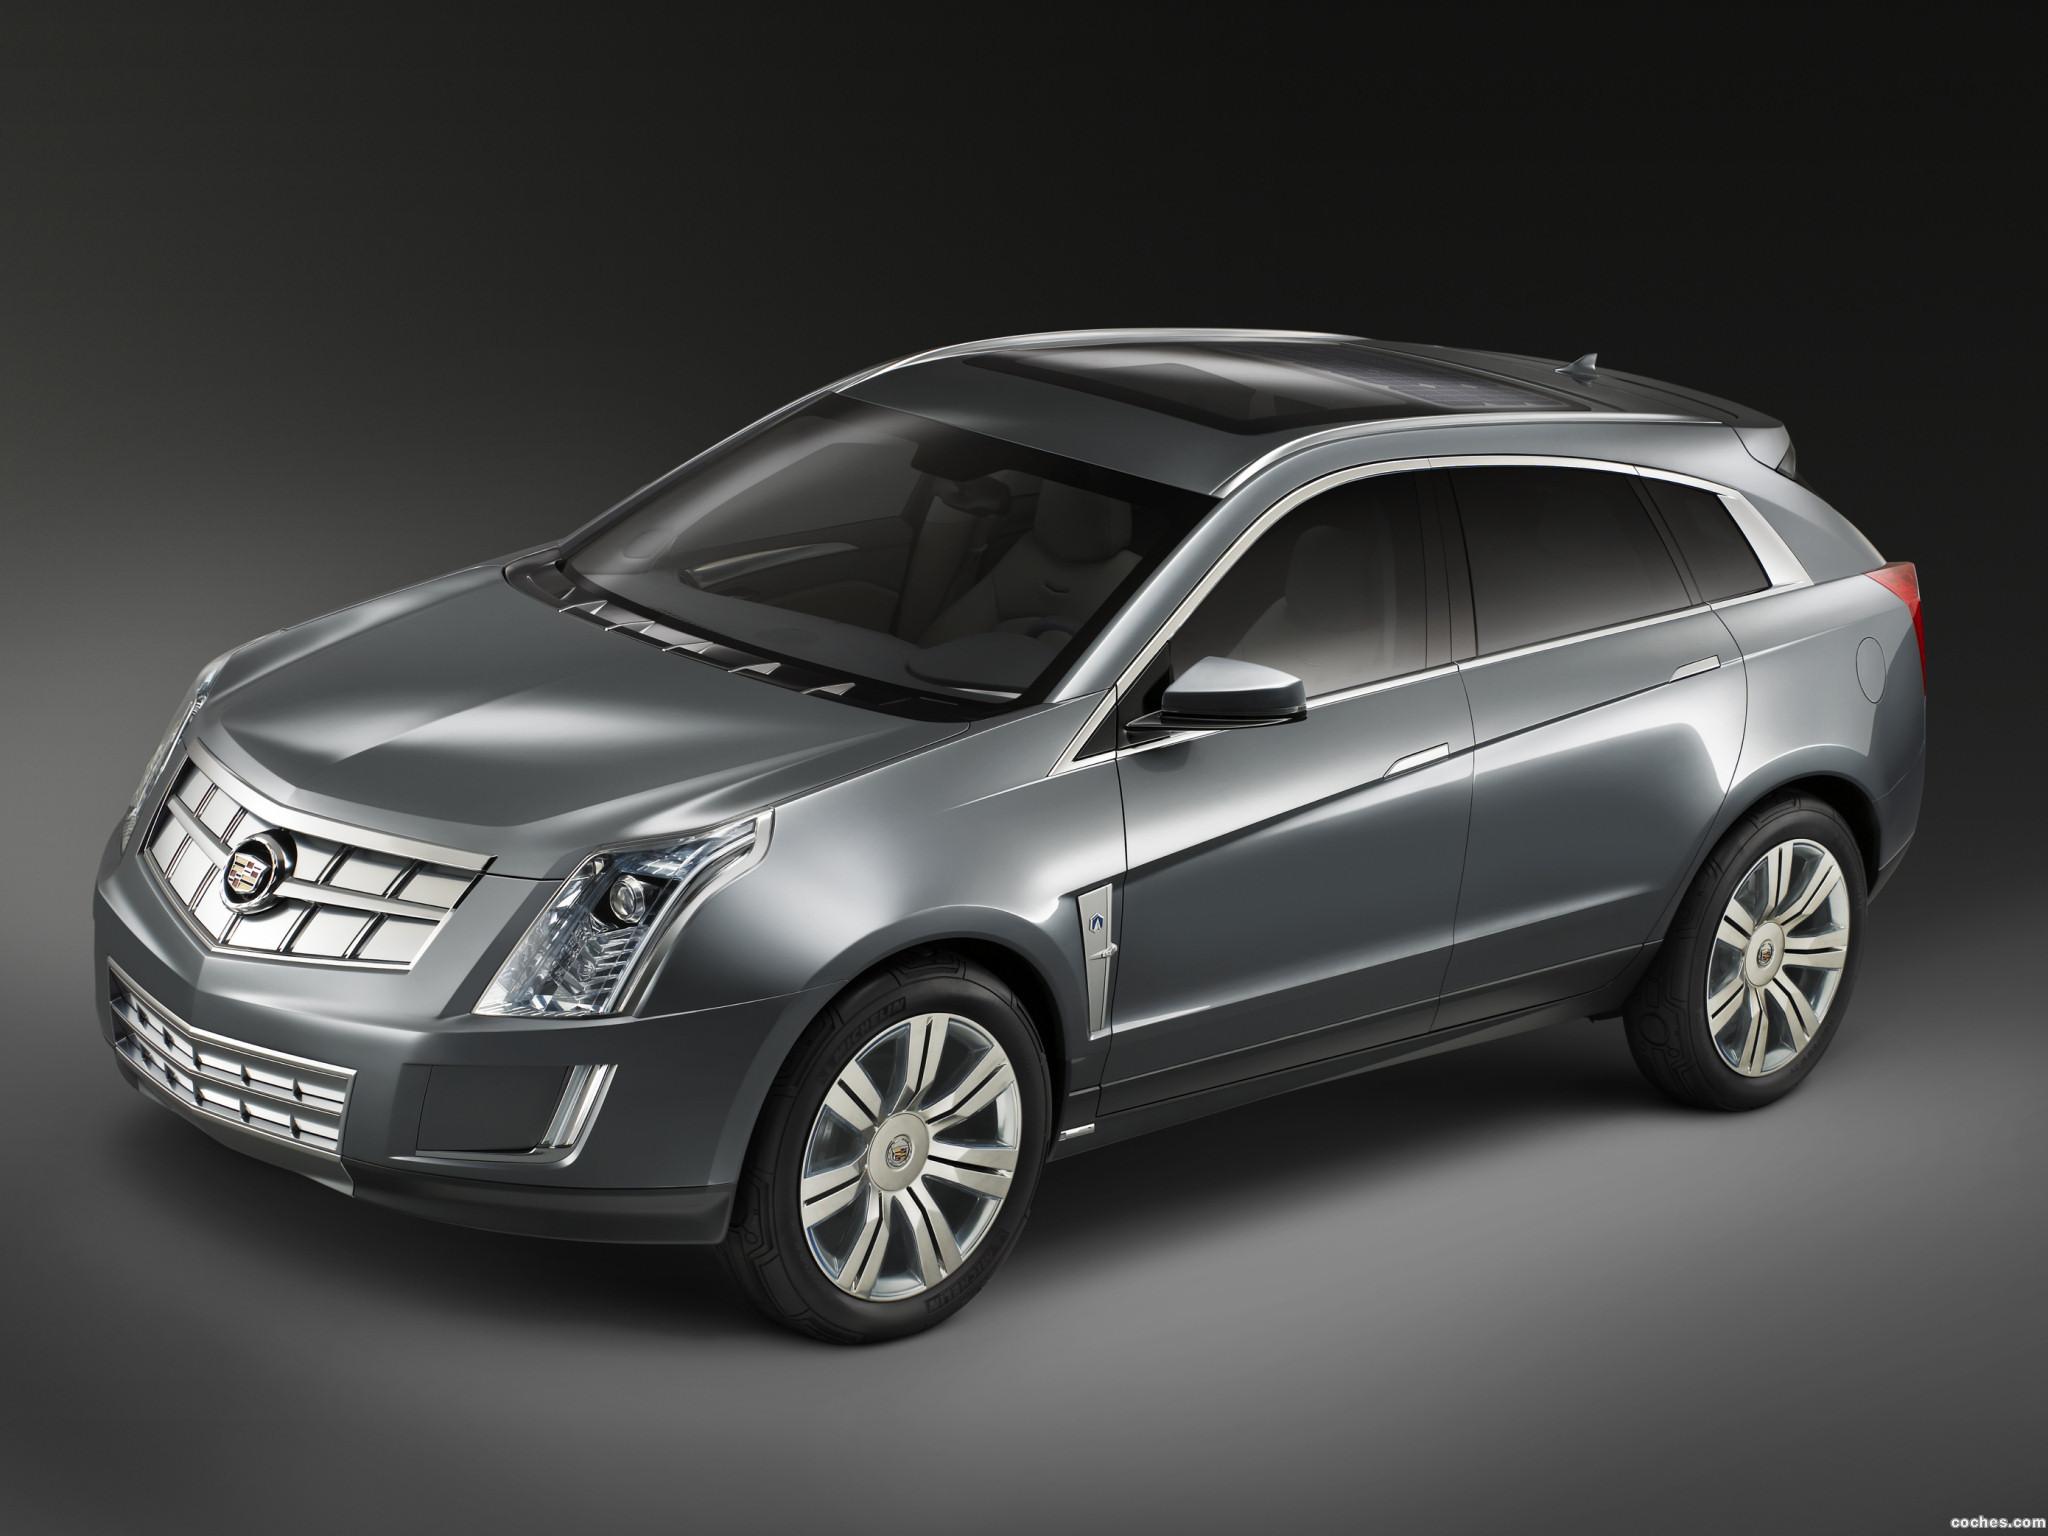 Foto 0 de Cadillac Provoq Fuel Cell Concept 2008